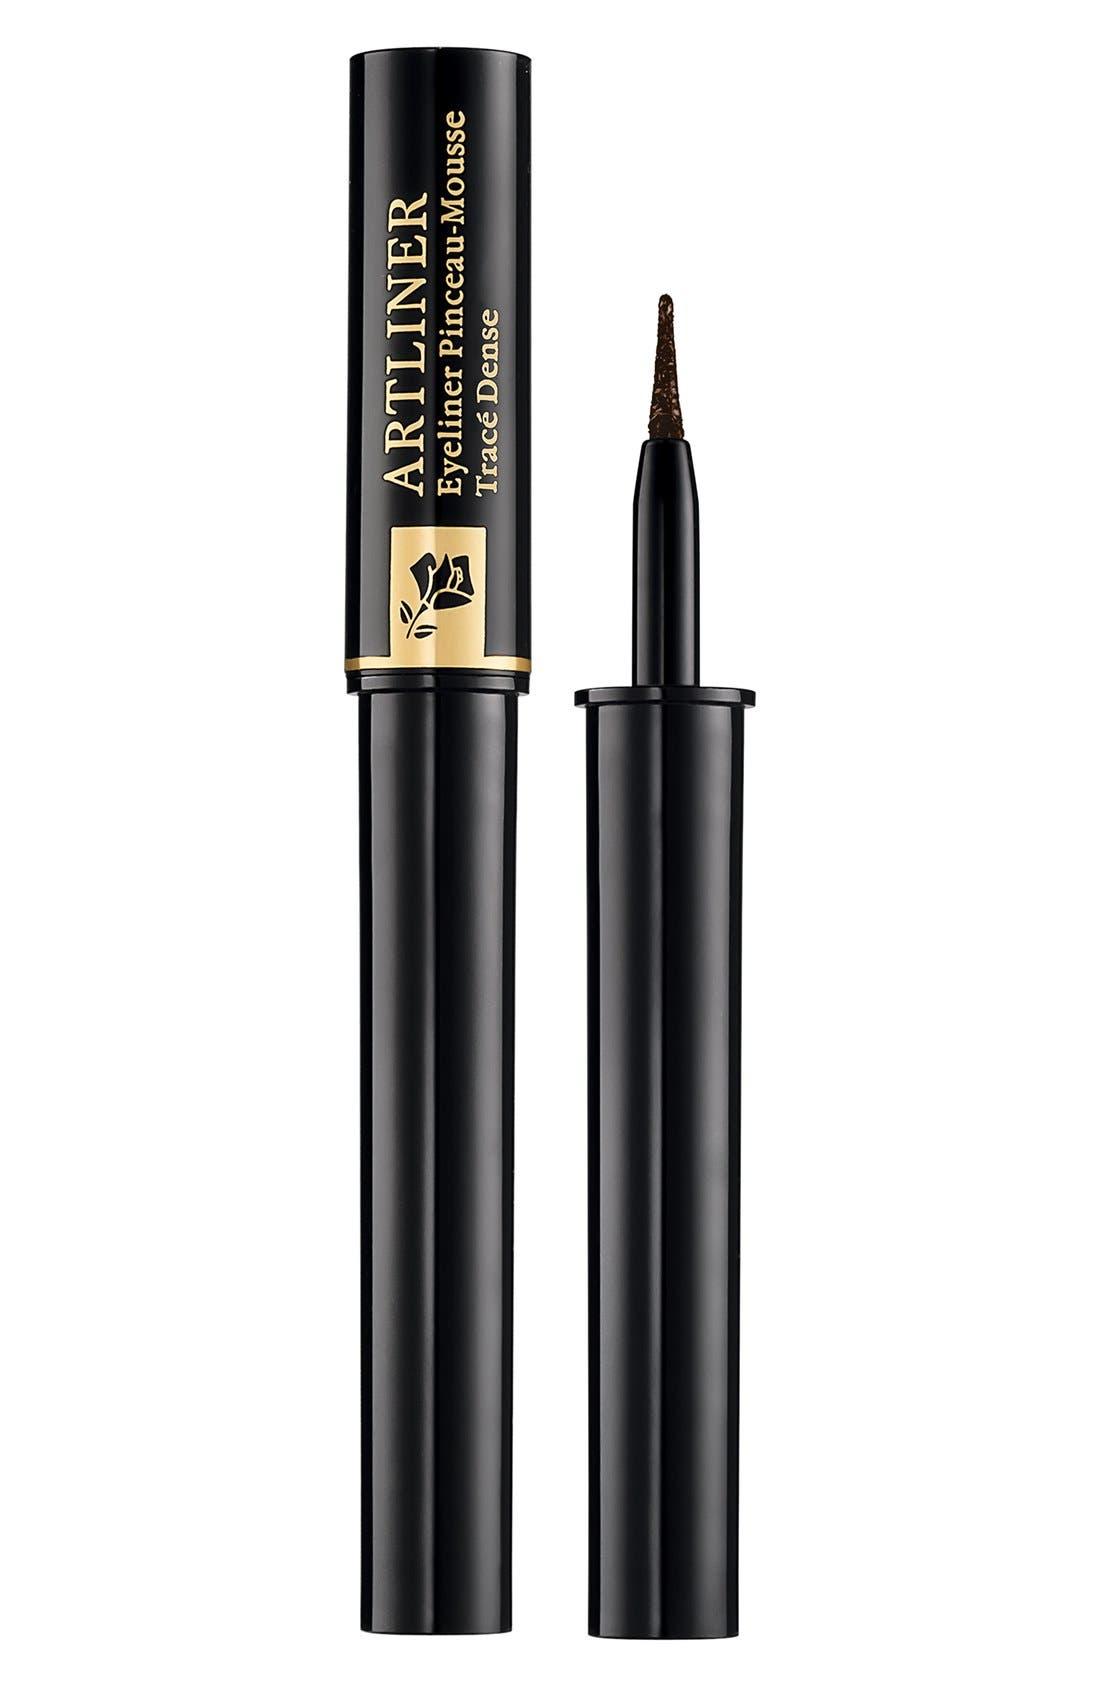 Lancome Artliner Precision Point Liquid Eyeliner - Chocolat